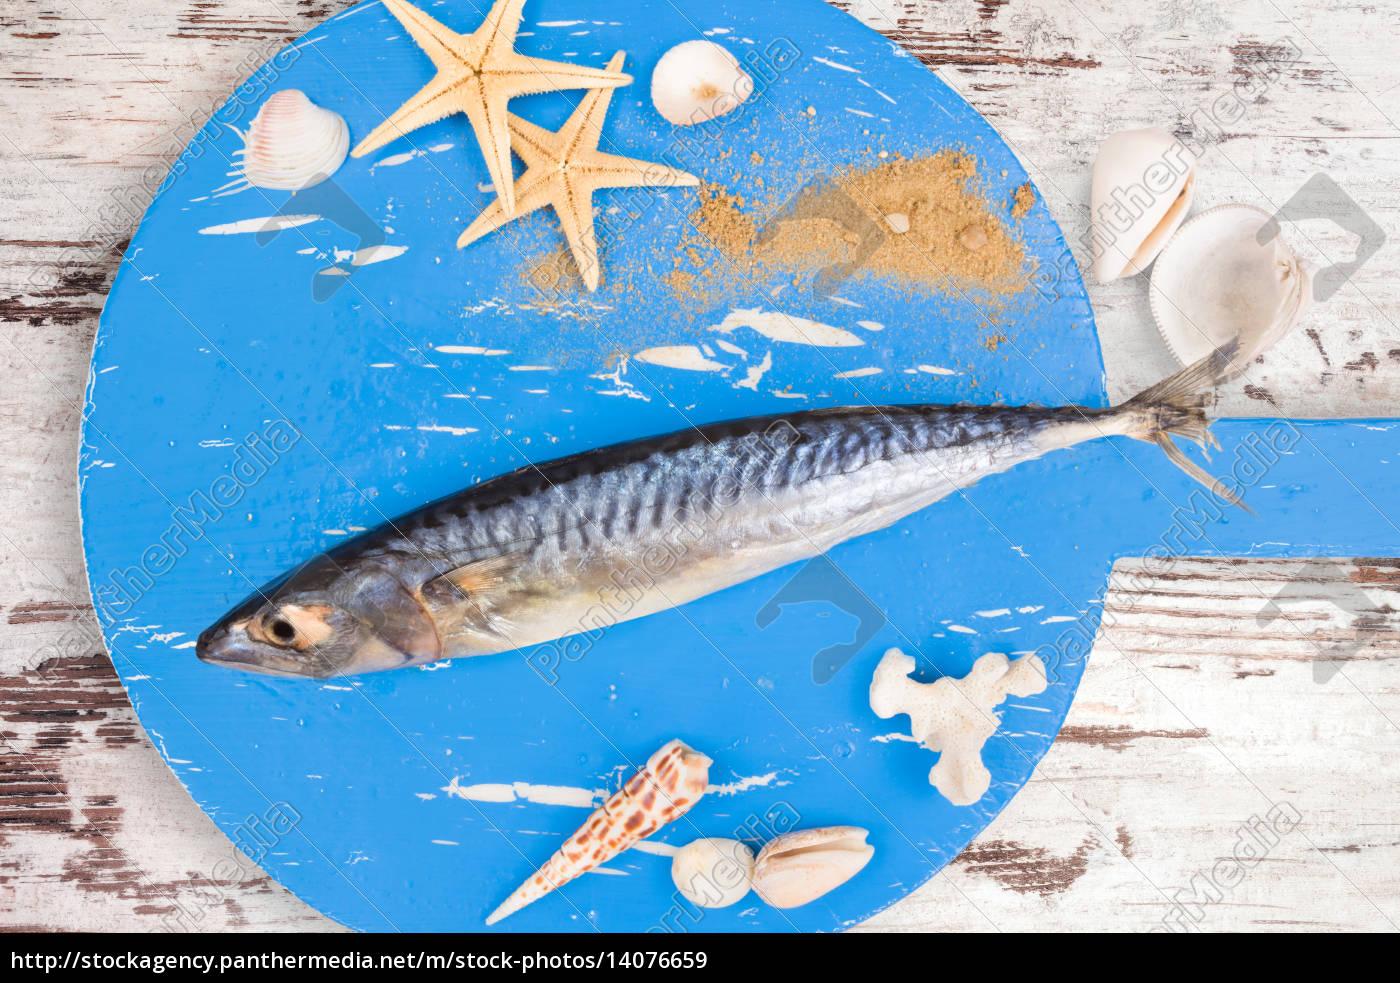 food, aliment, animal, shell, water, mediterranean - 14076659